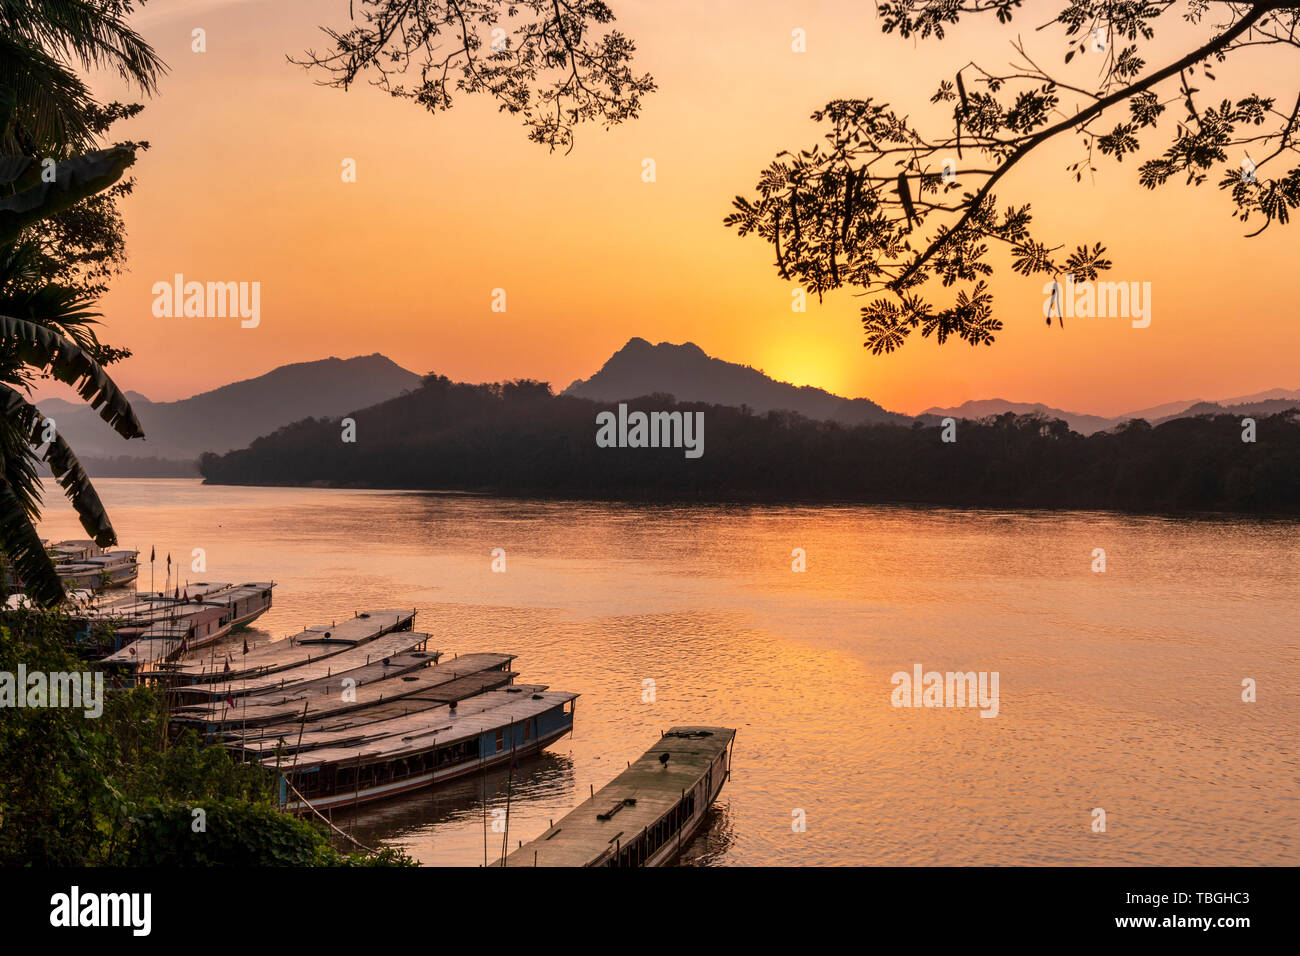 Mekong River at sunset in Luang Prabang, tour boats, Laos, southeast Asia Stock Photo